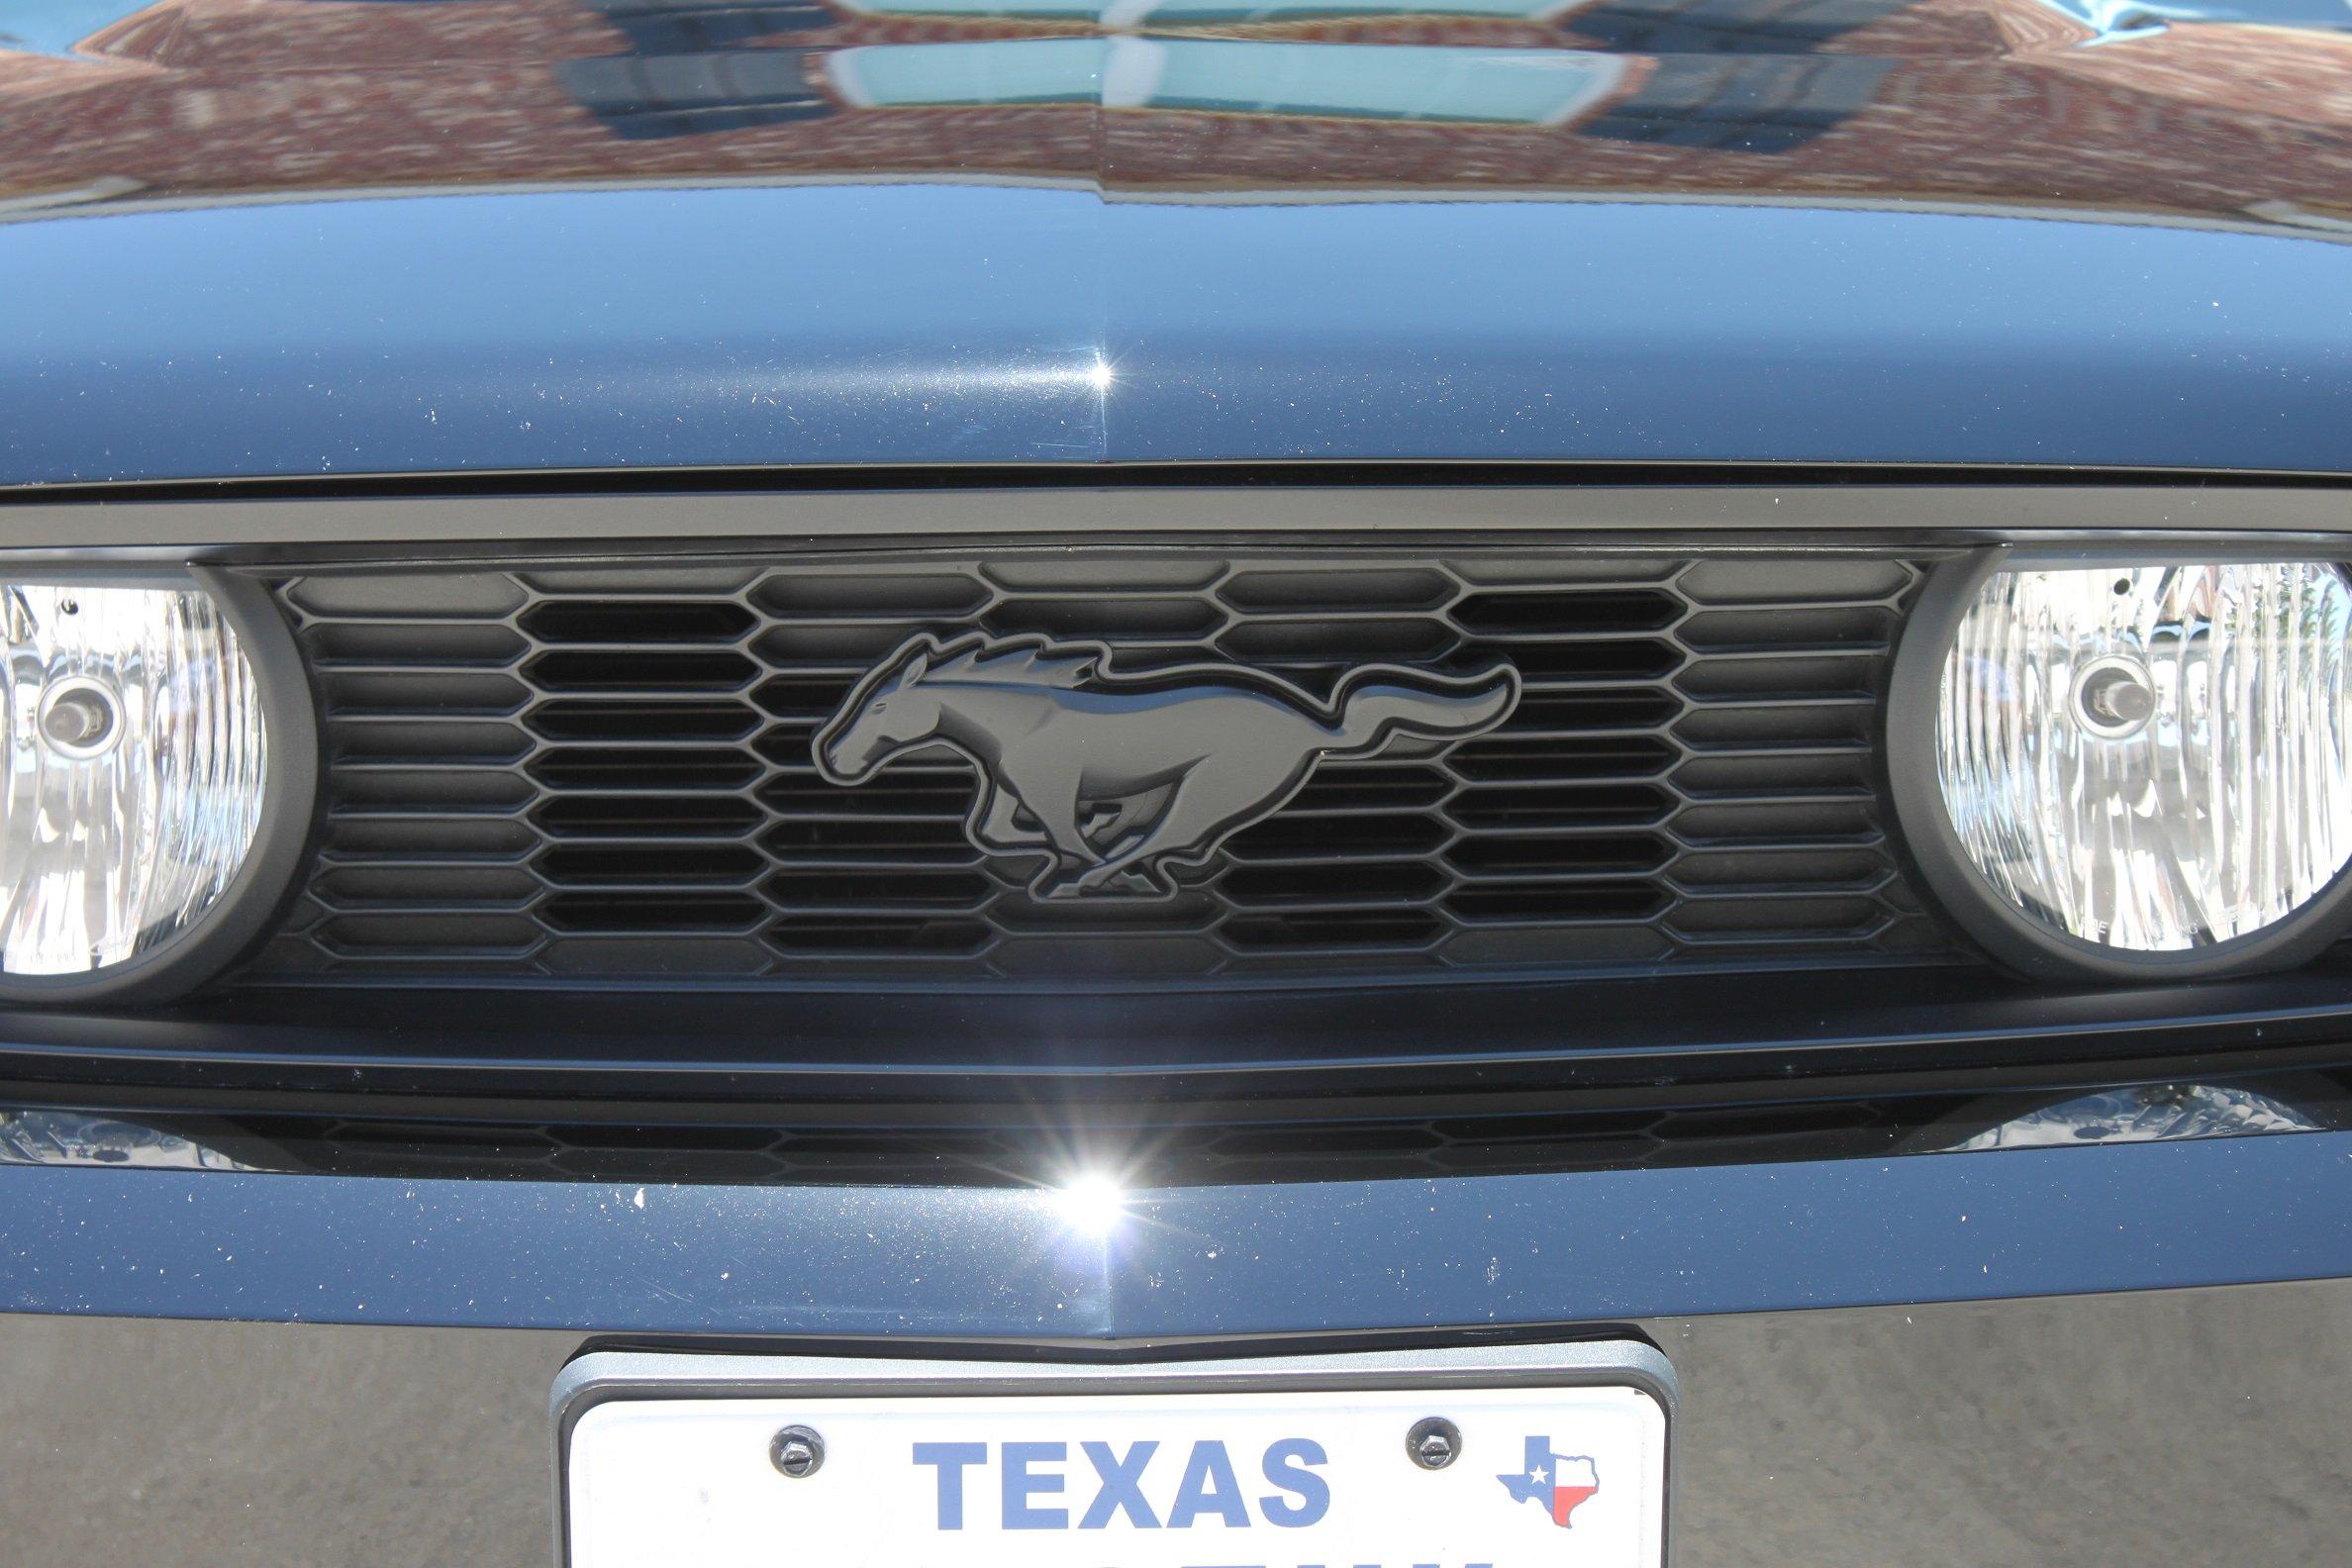 Plasti Dip Emblems >> Plasti Dip Emblems Ford Mustang Forum